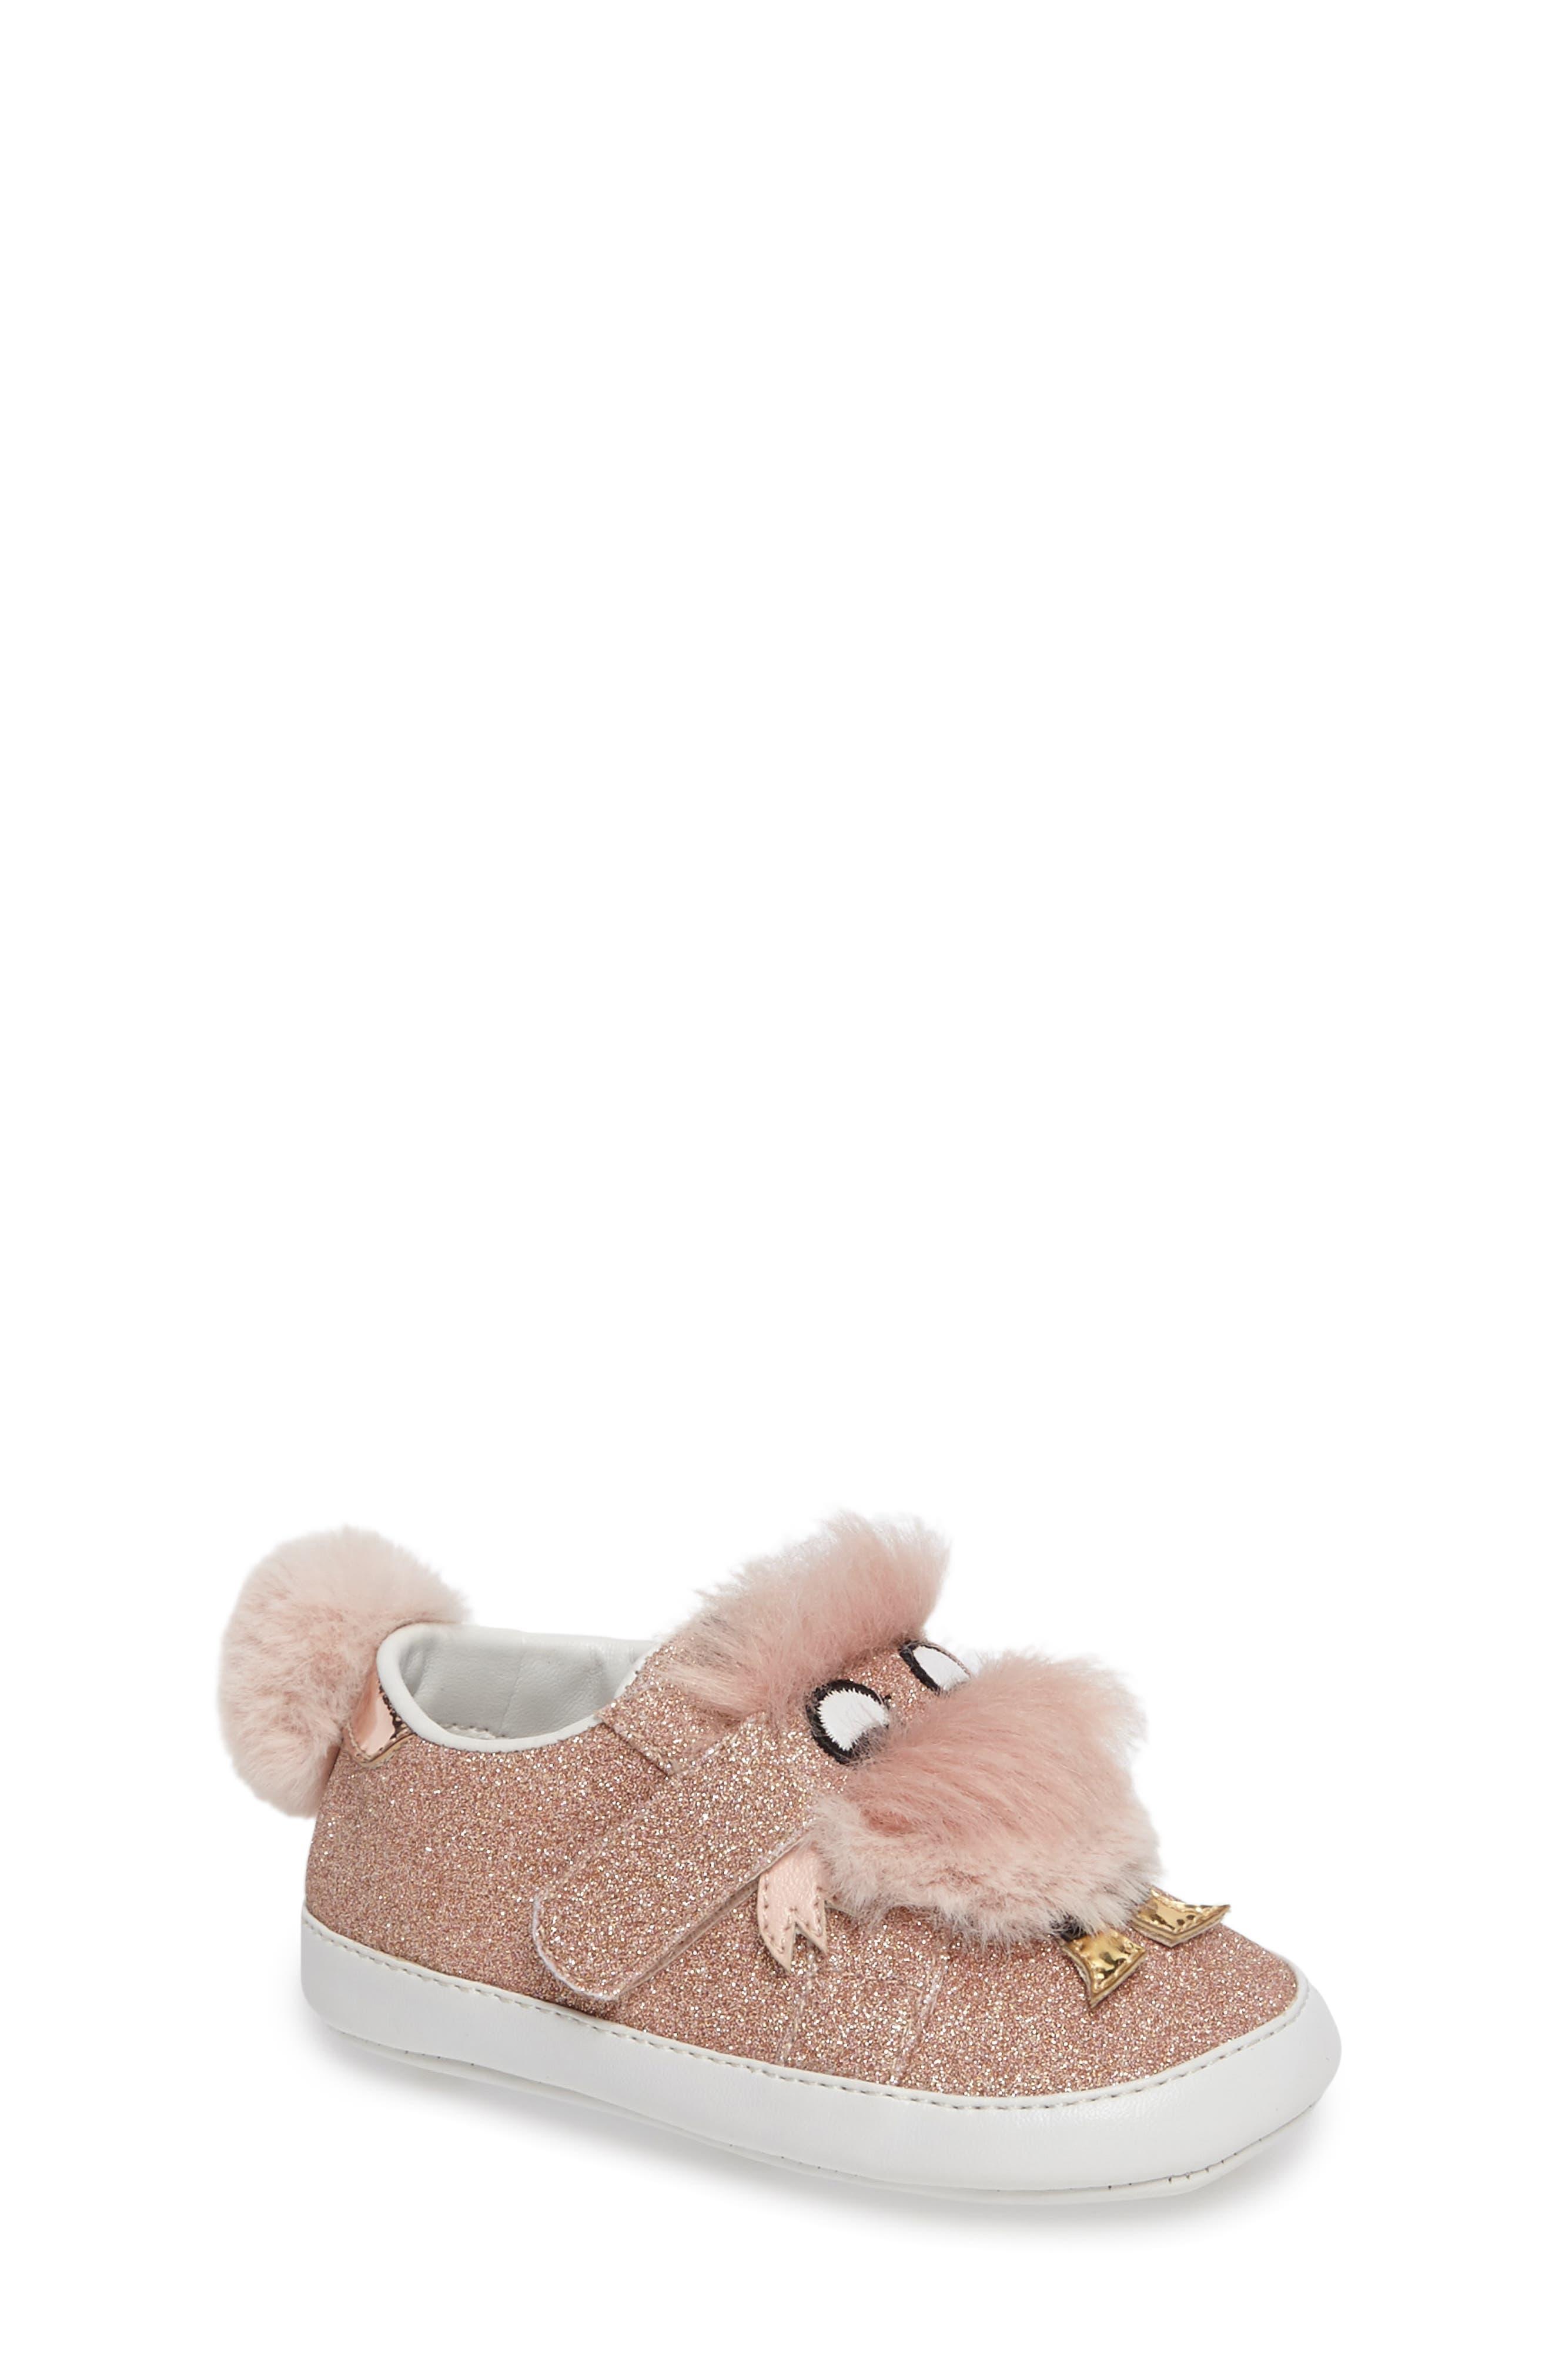 Alternate Image 1 Selected - Sam Edelman Ovee Sneaker (Baby)